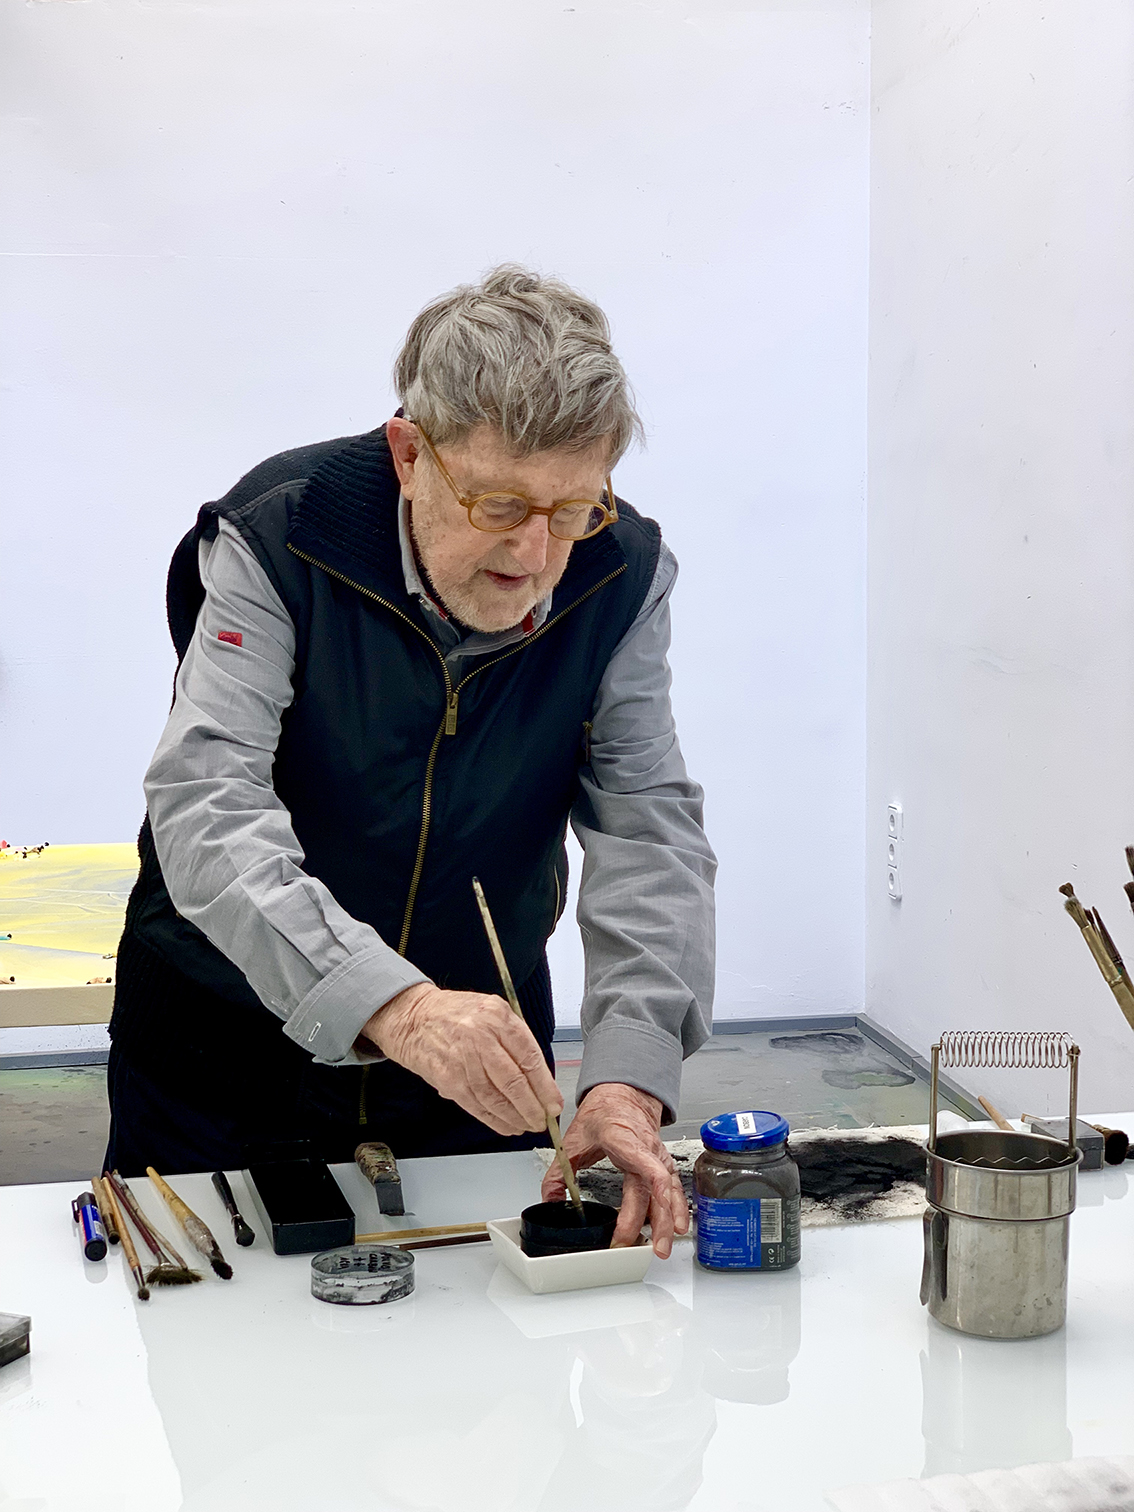 Juan Genovés no seu estúdio, retrato de Leonardo Villela, cortesia da galeria Malborough.